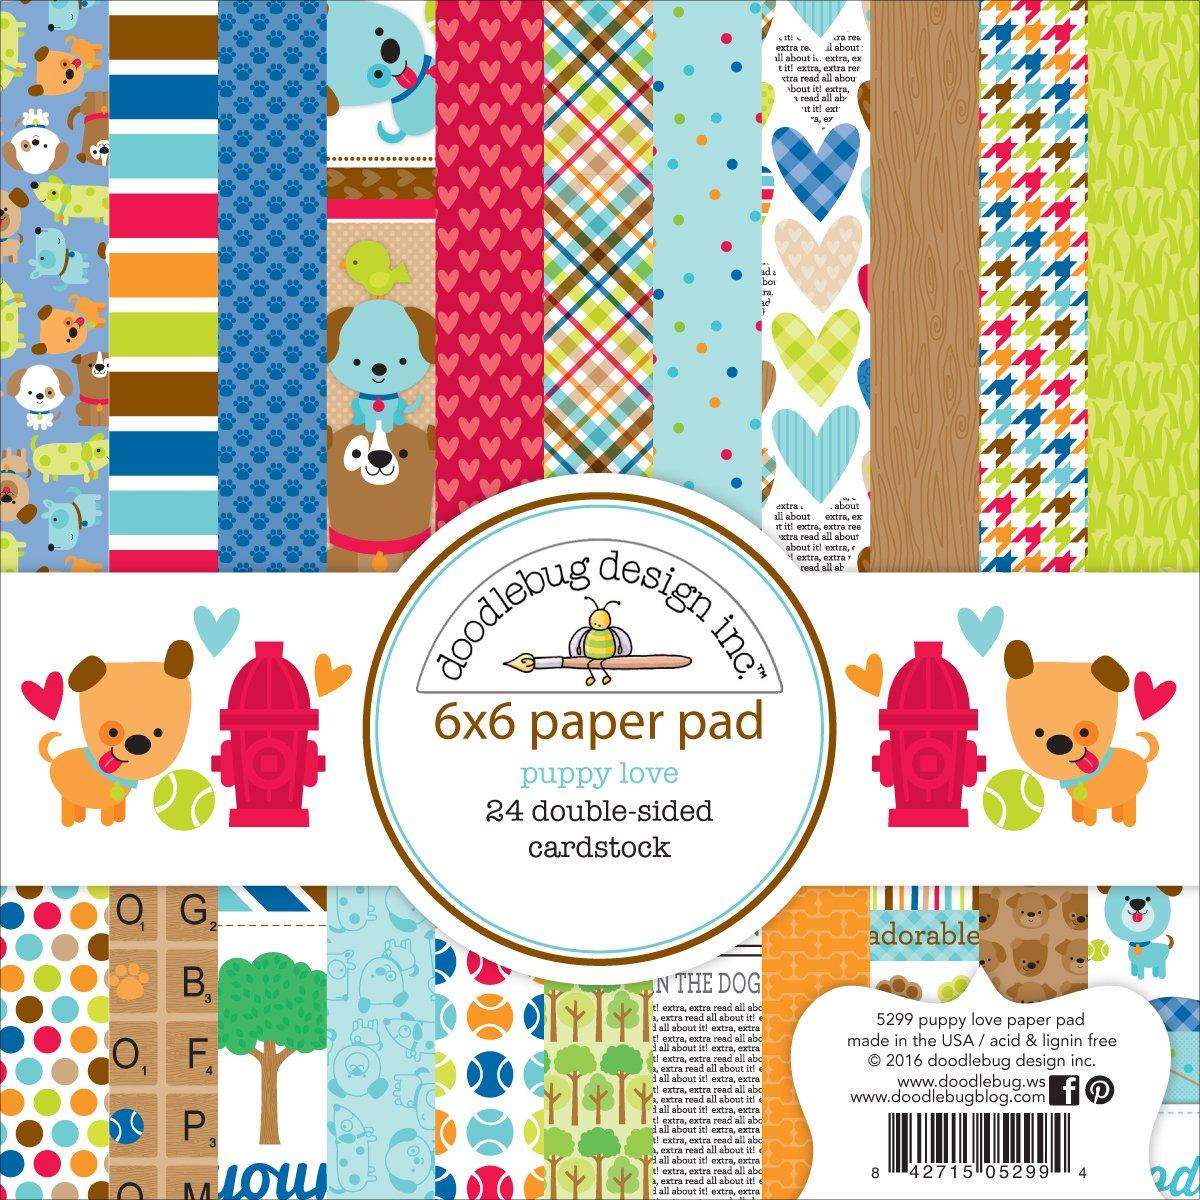 Doodlebug Doppelseitiges Papier Pad 6/x 6/2 Mehrfarbig